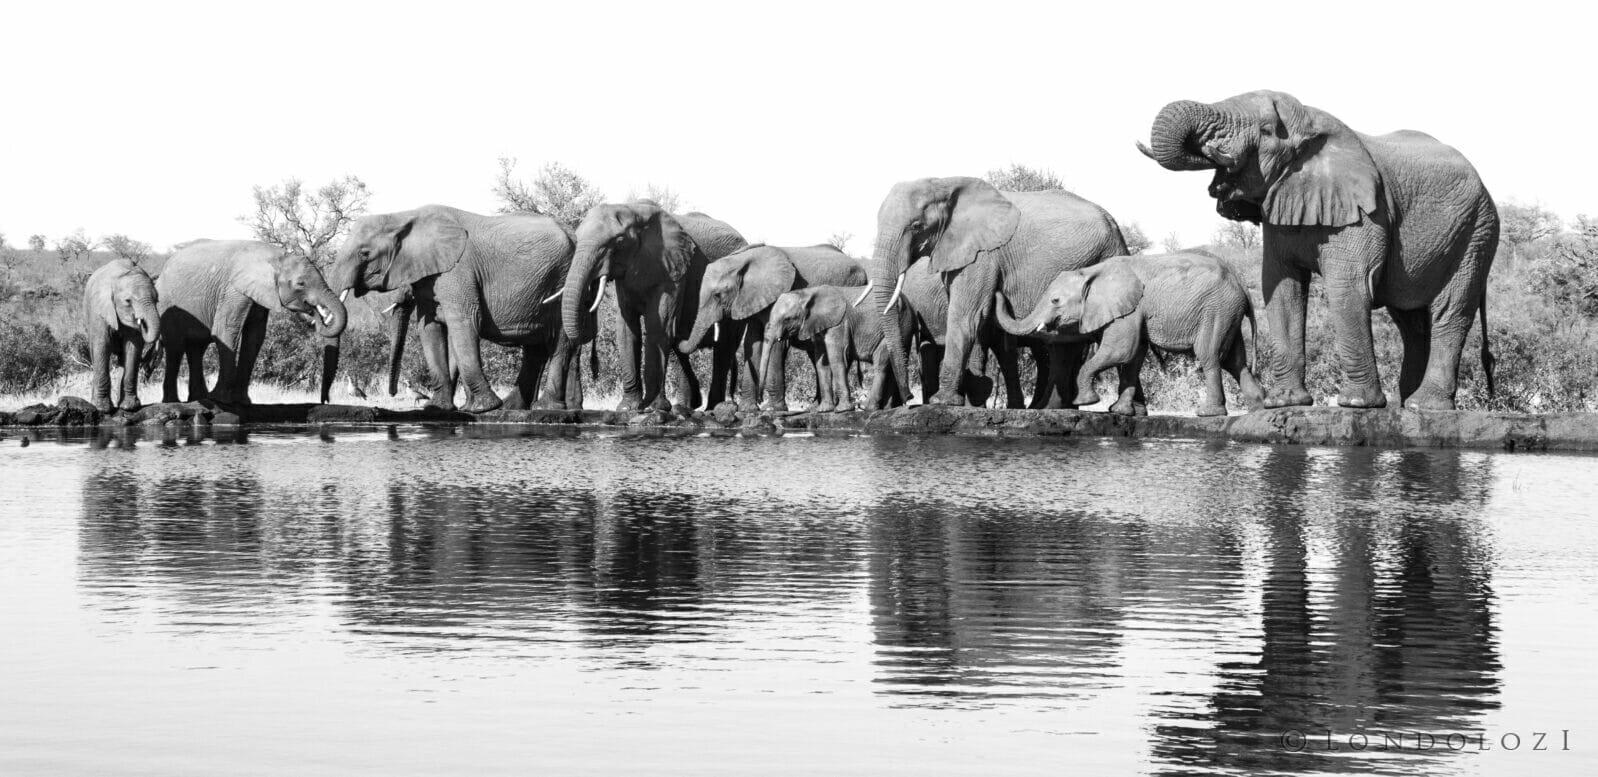 Black And White Herd Elephant Drnking High Key Dean De La Rey Dlr 09:21